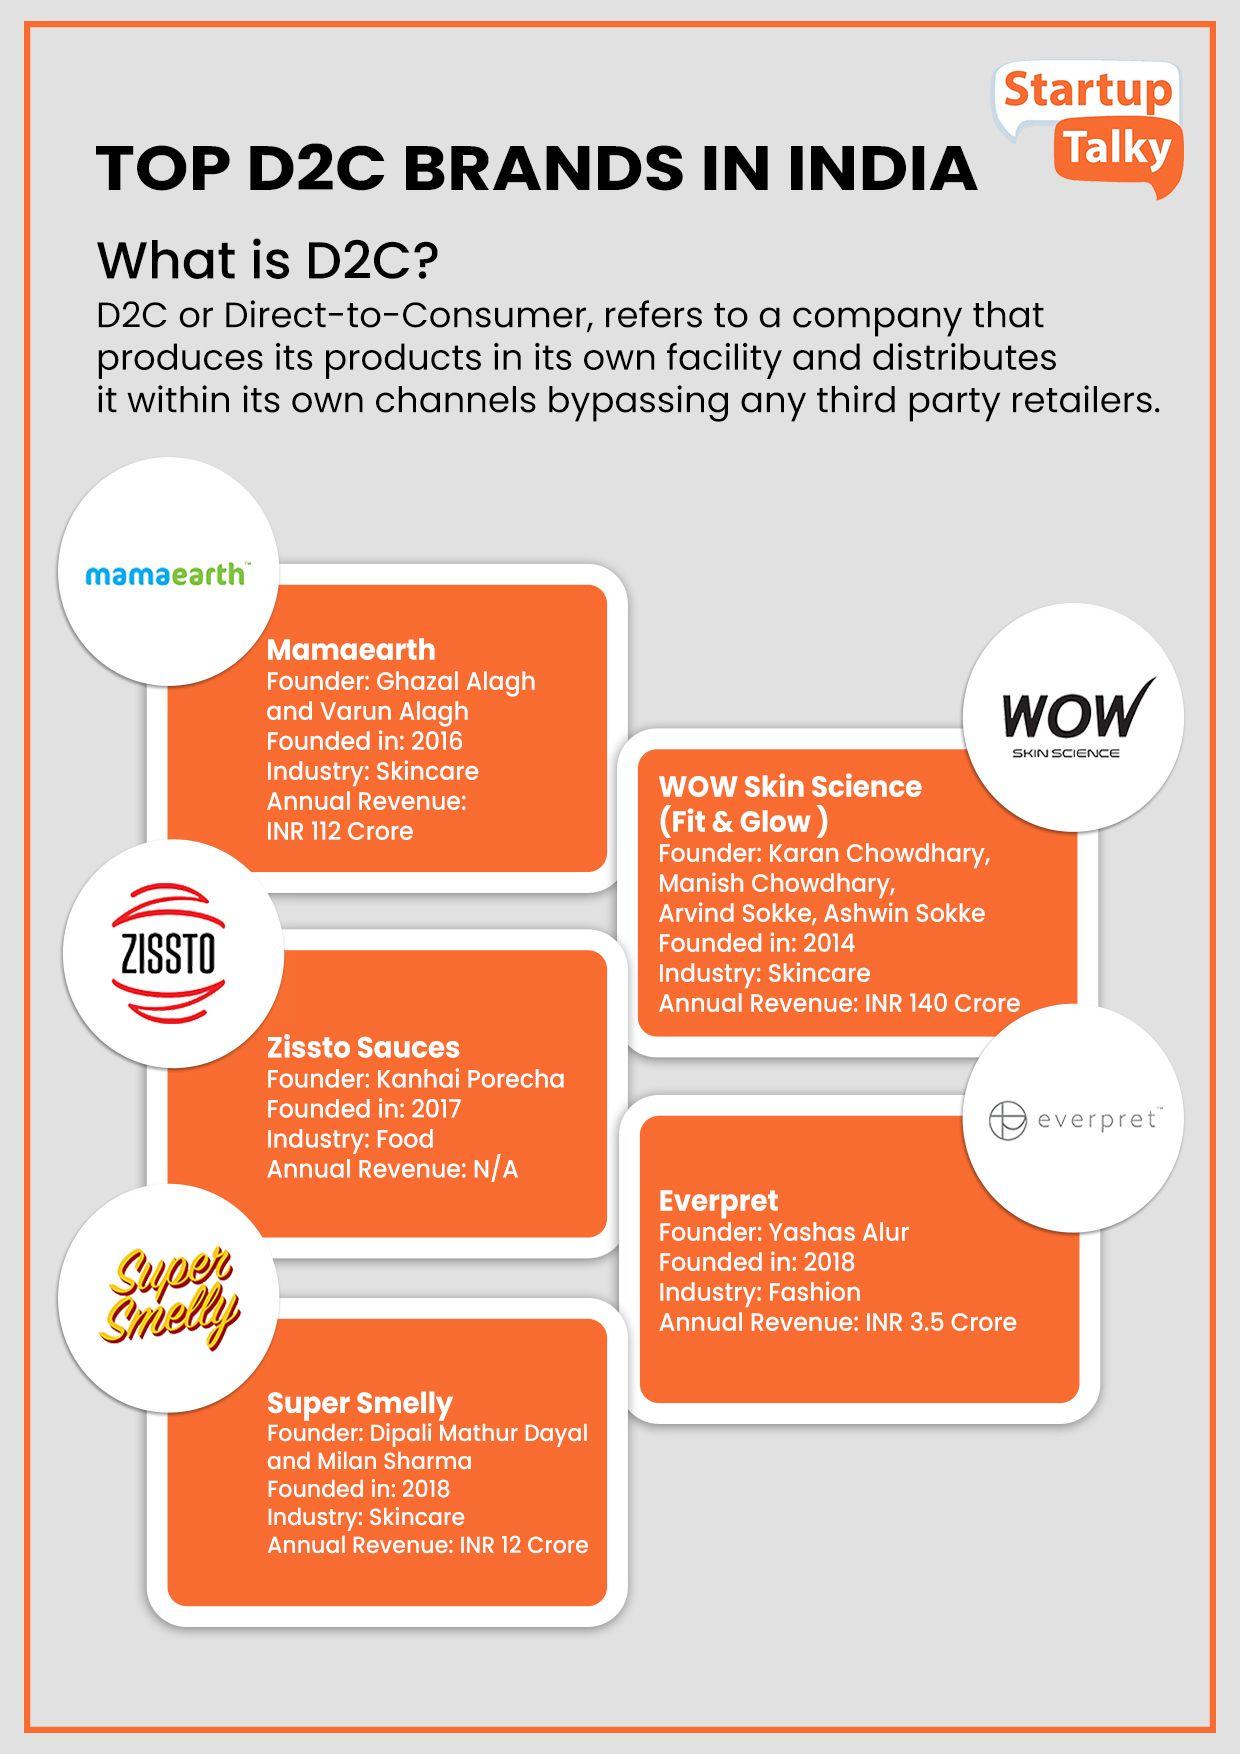 Best D2C startups